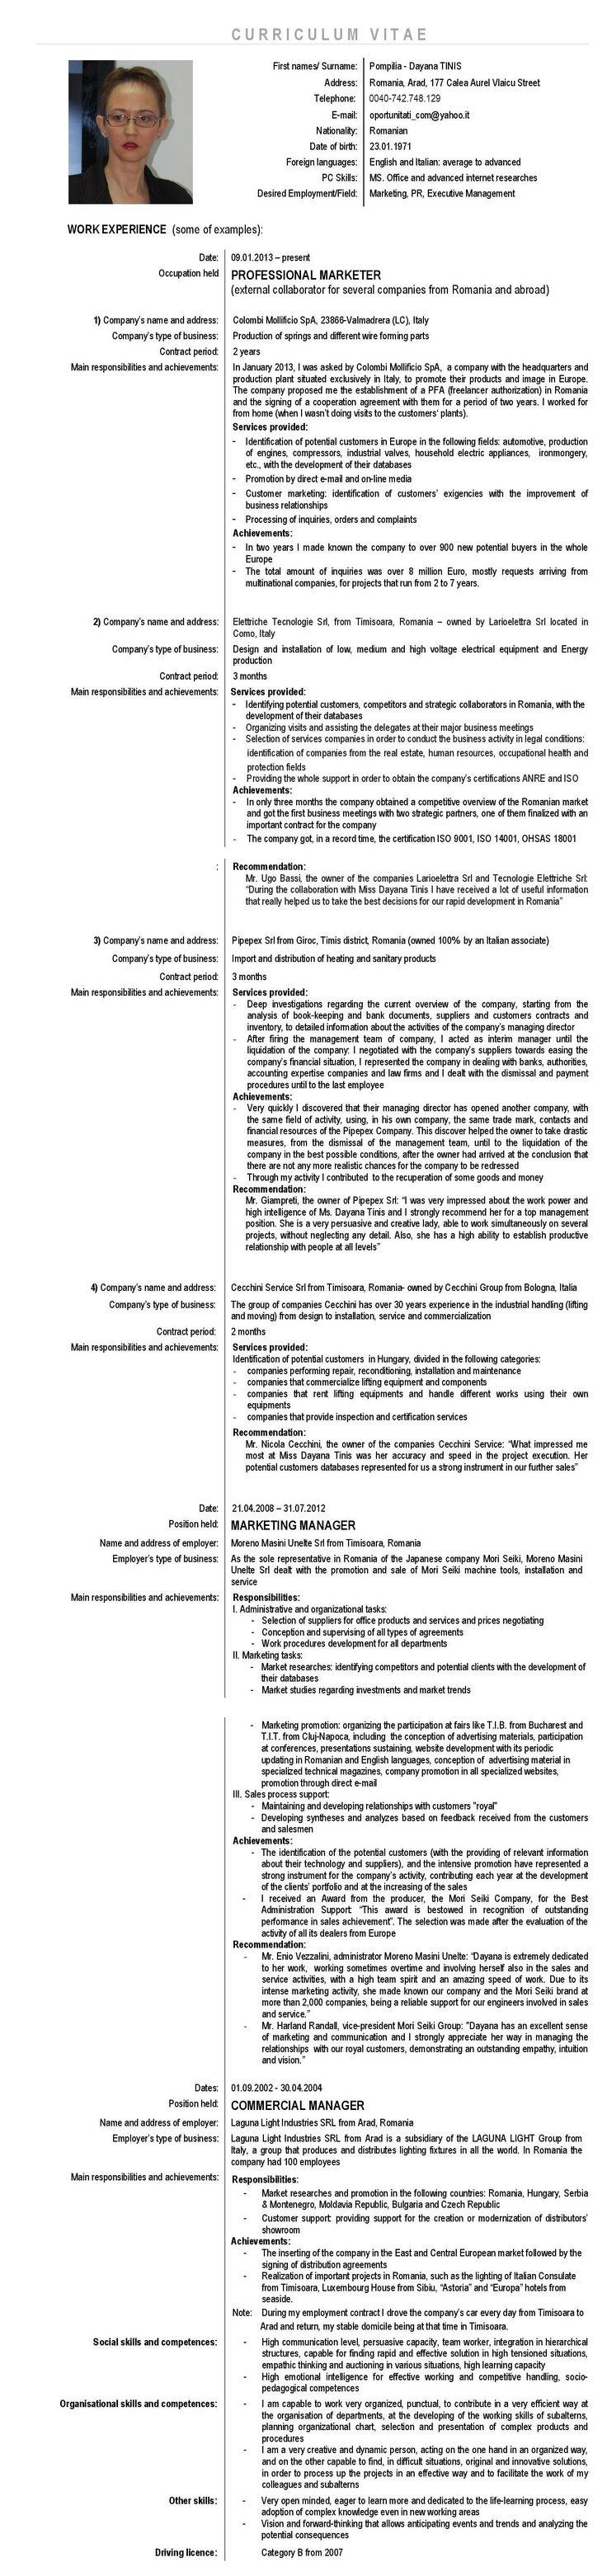 Curriculum Vitae English Vocabulary